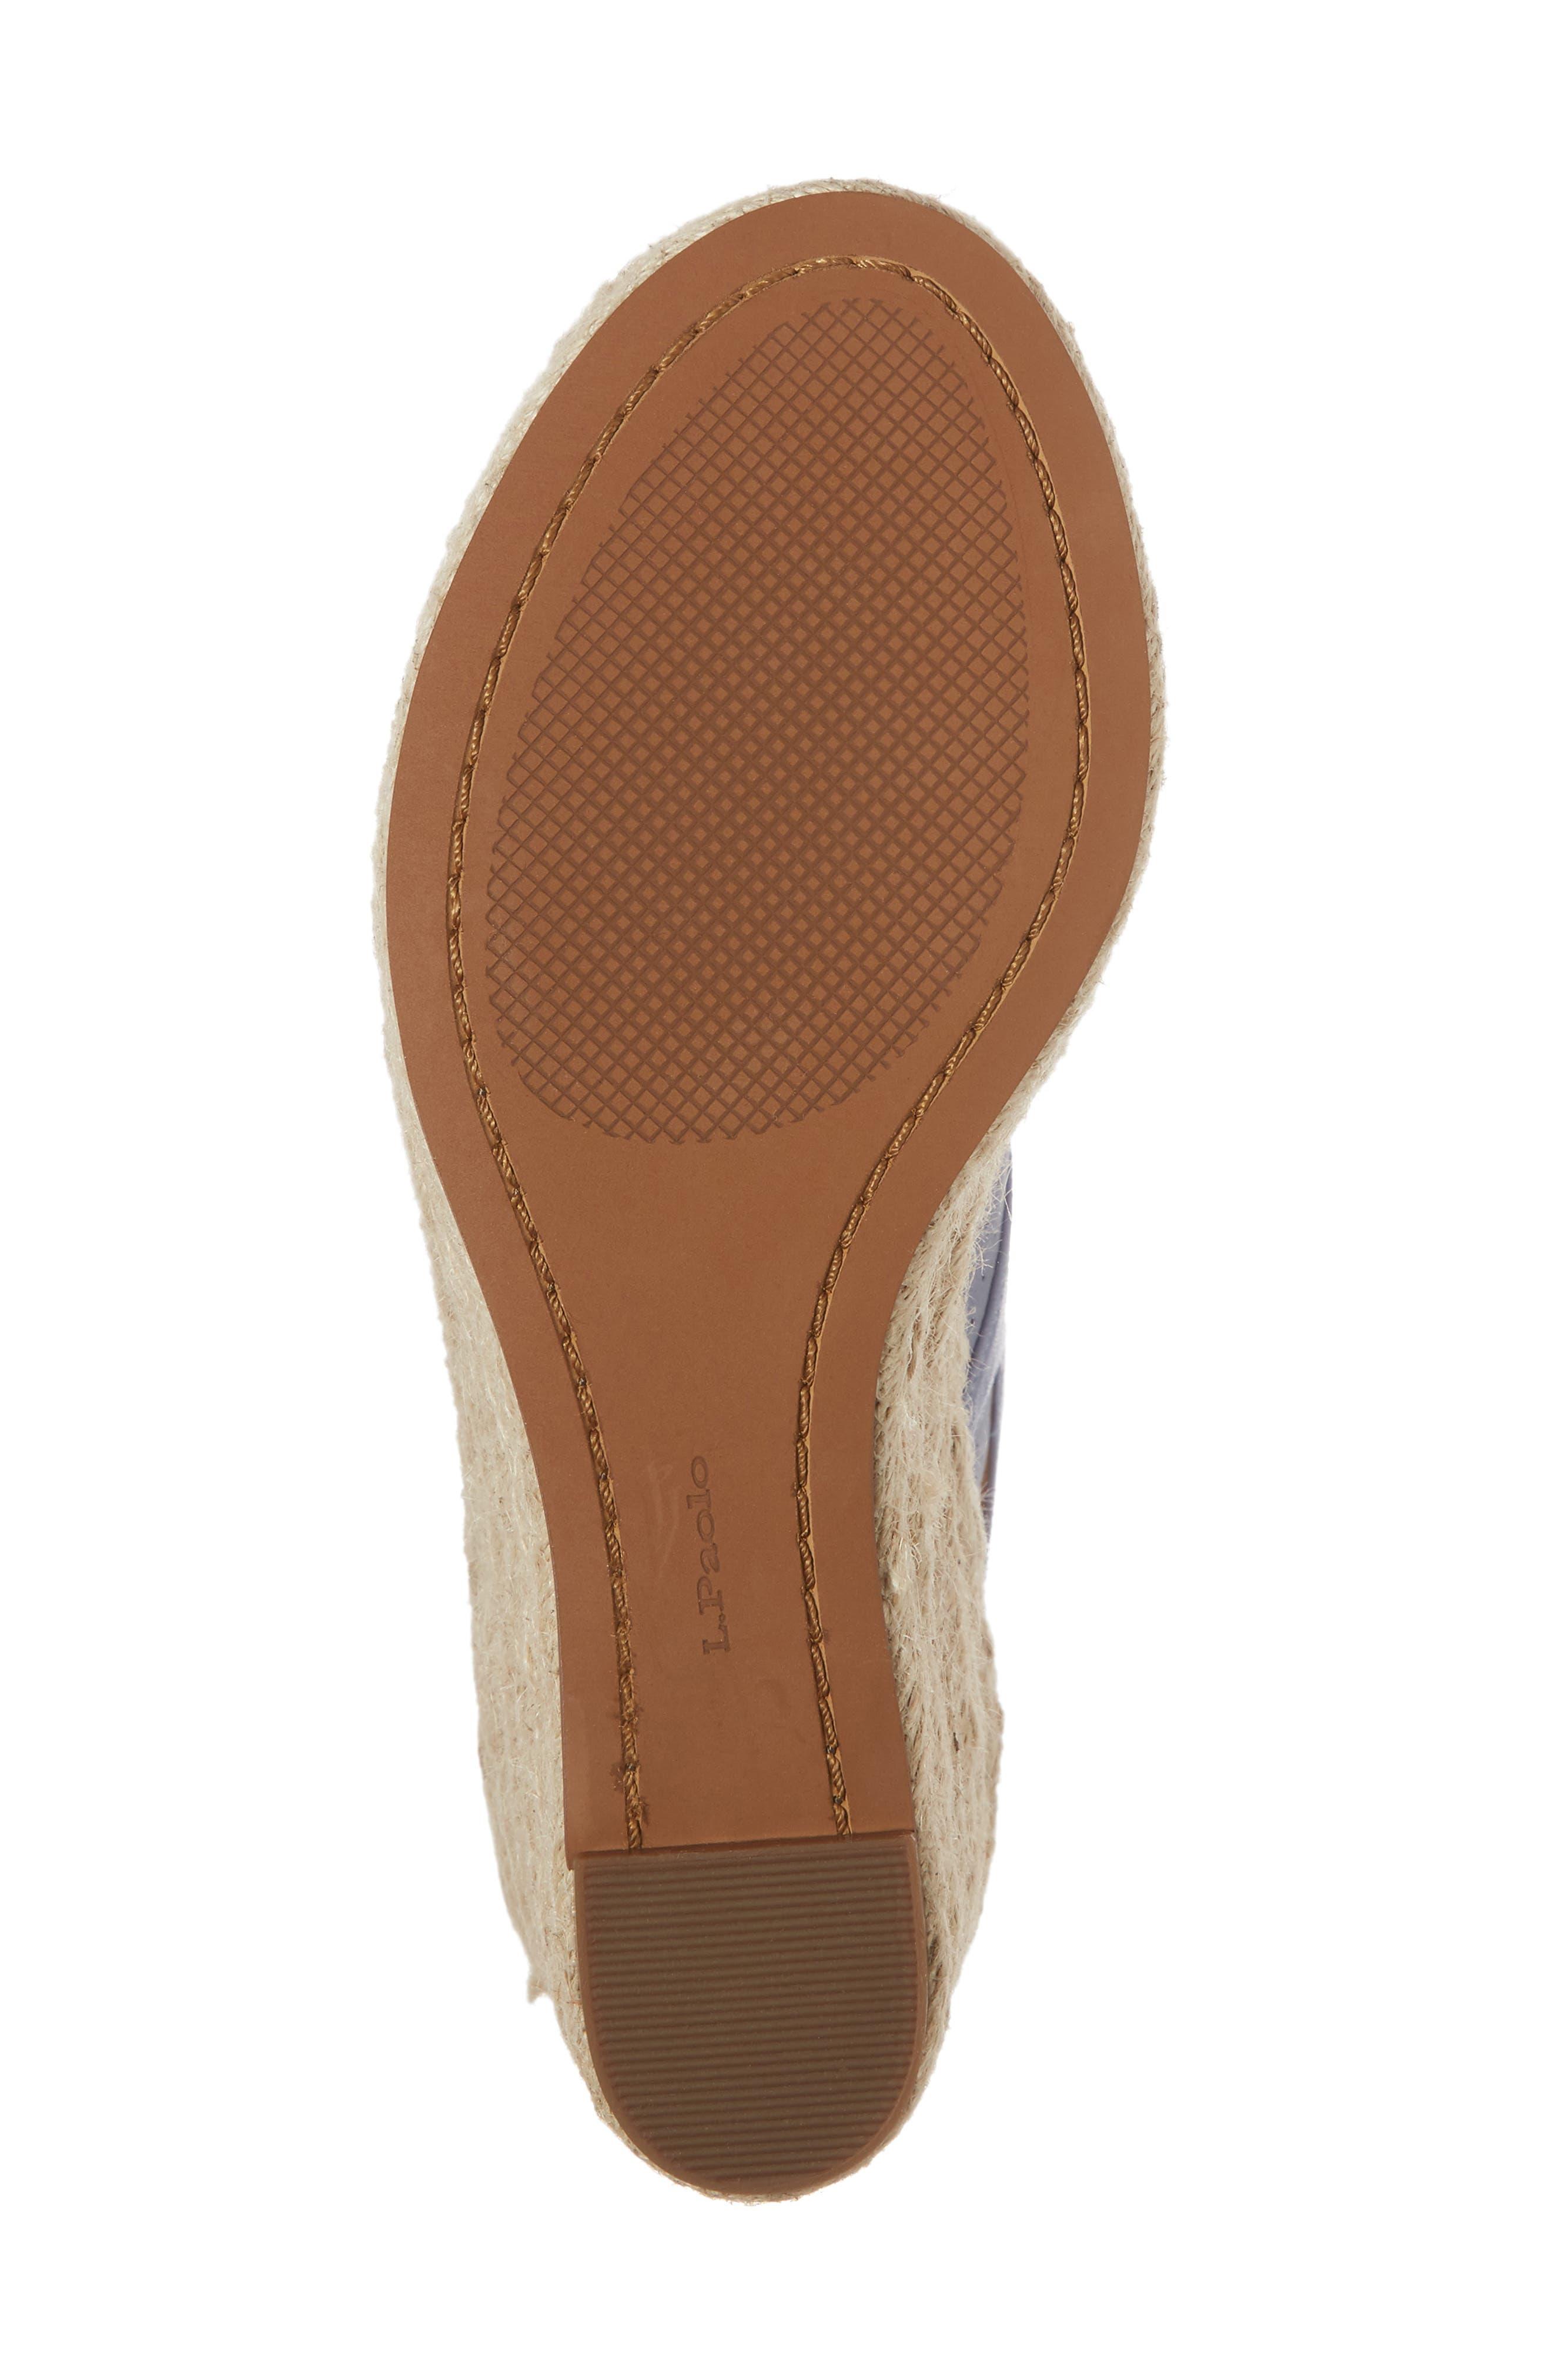 Everly Espadrille Wedge Sandal,                             Alternate thumbnail 7, color,                             Blue Nubuck Leather